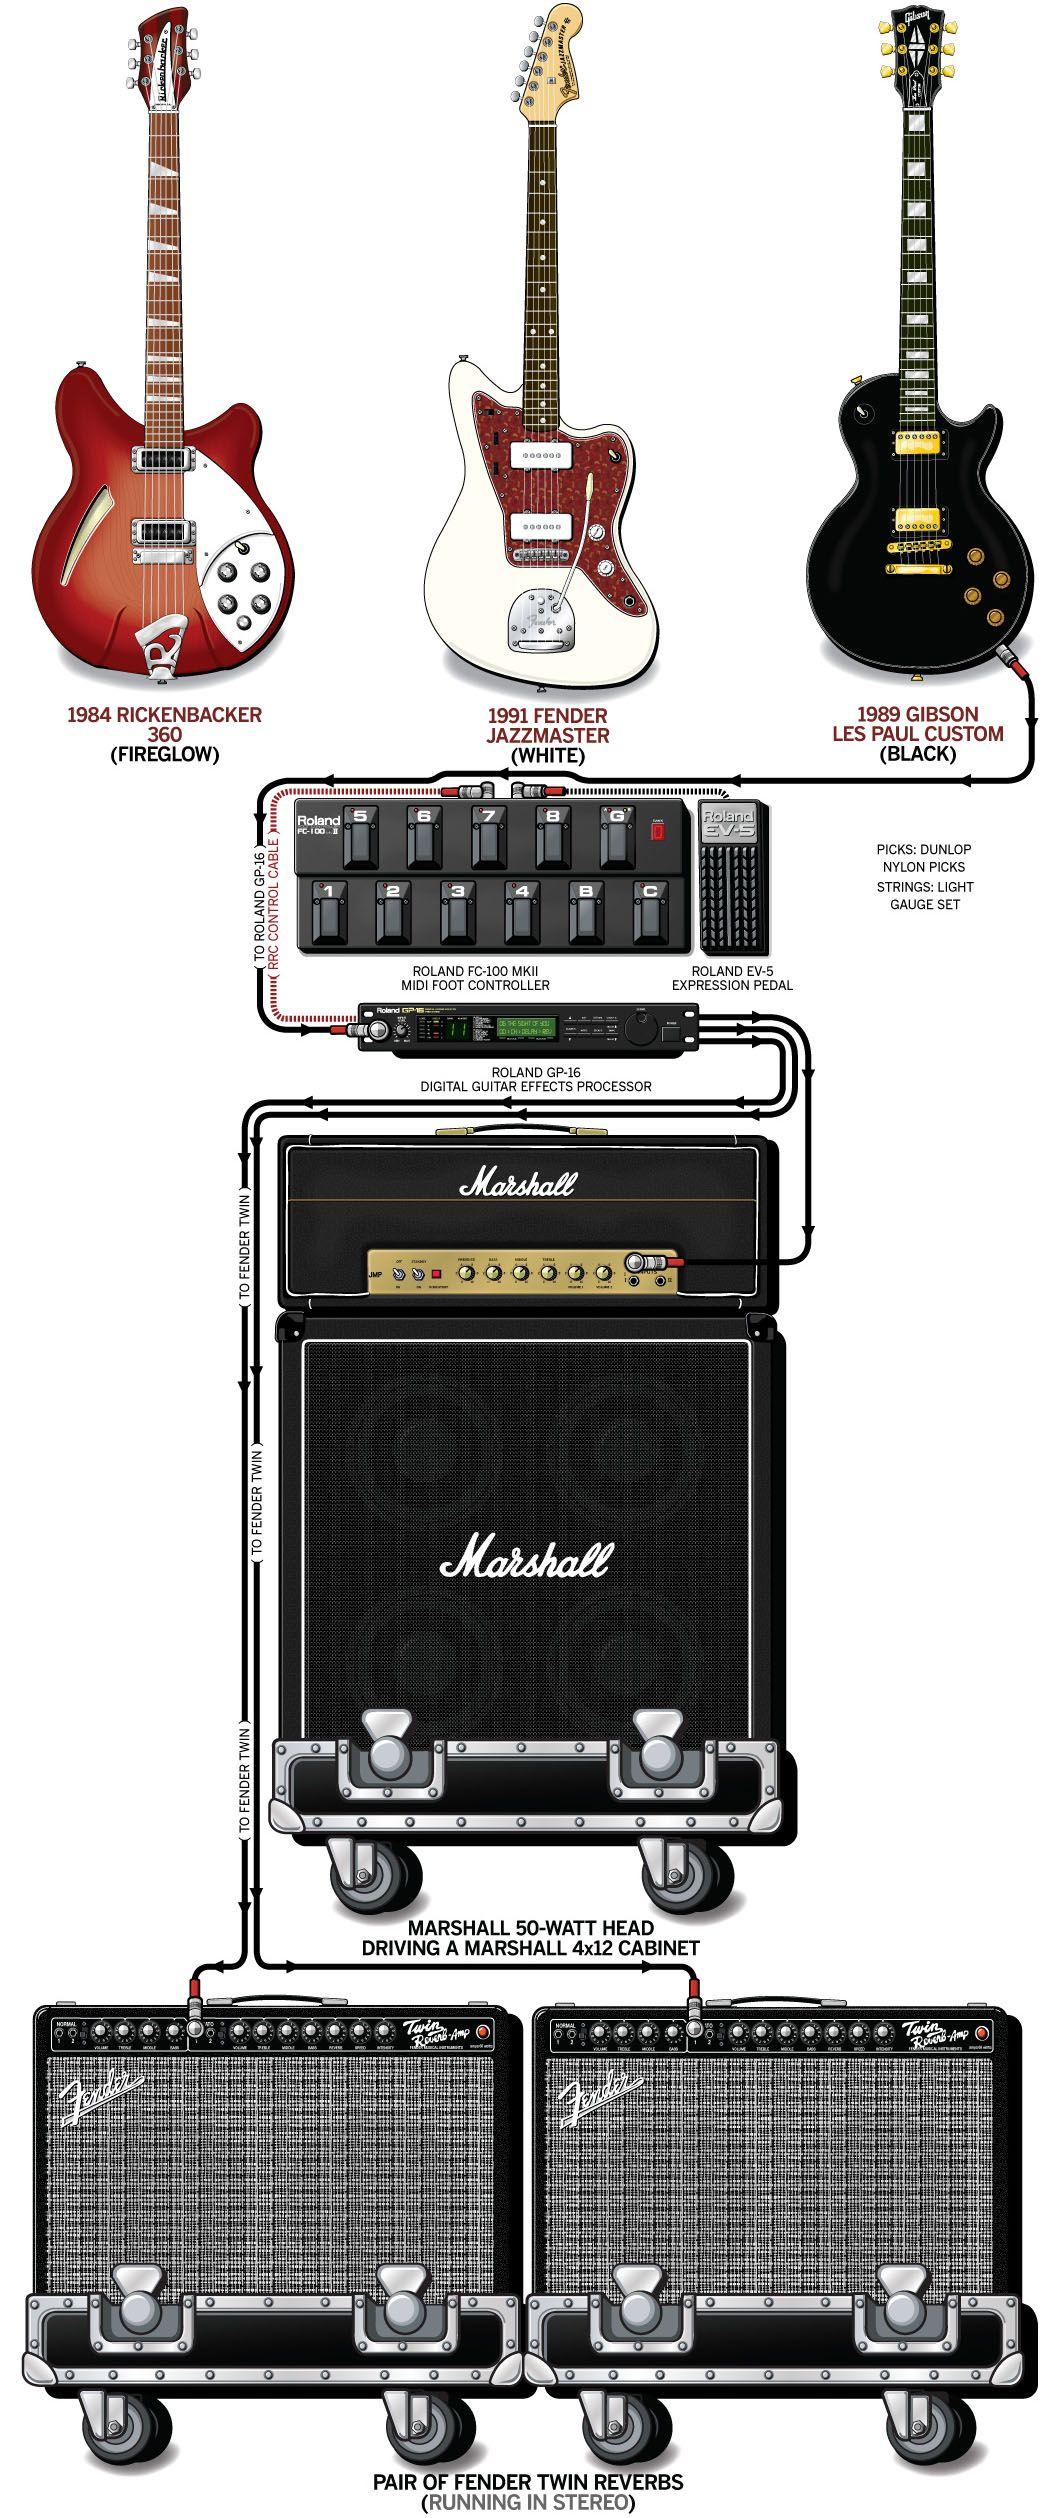 Pale Saints Graeme Naysmith Guitar Rig Guitar Rig Guitar Effects Pedals Guitar Pedals